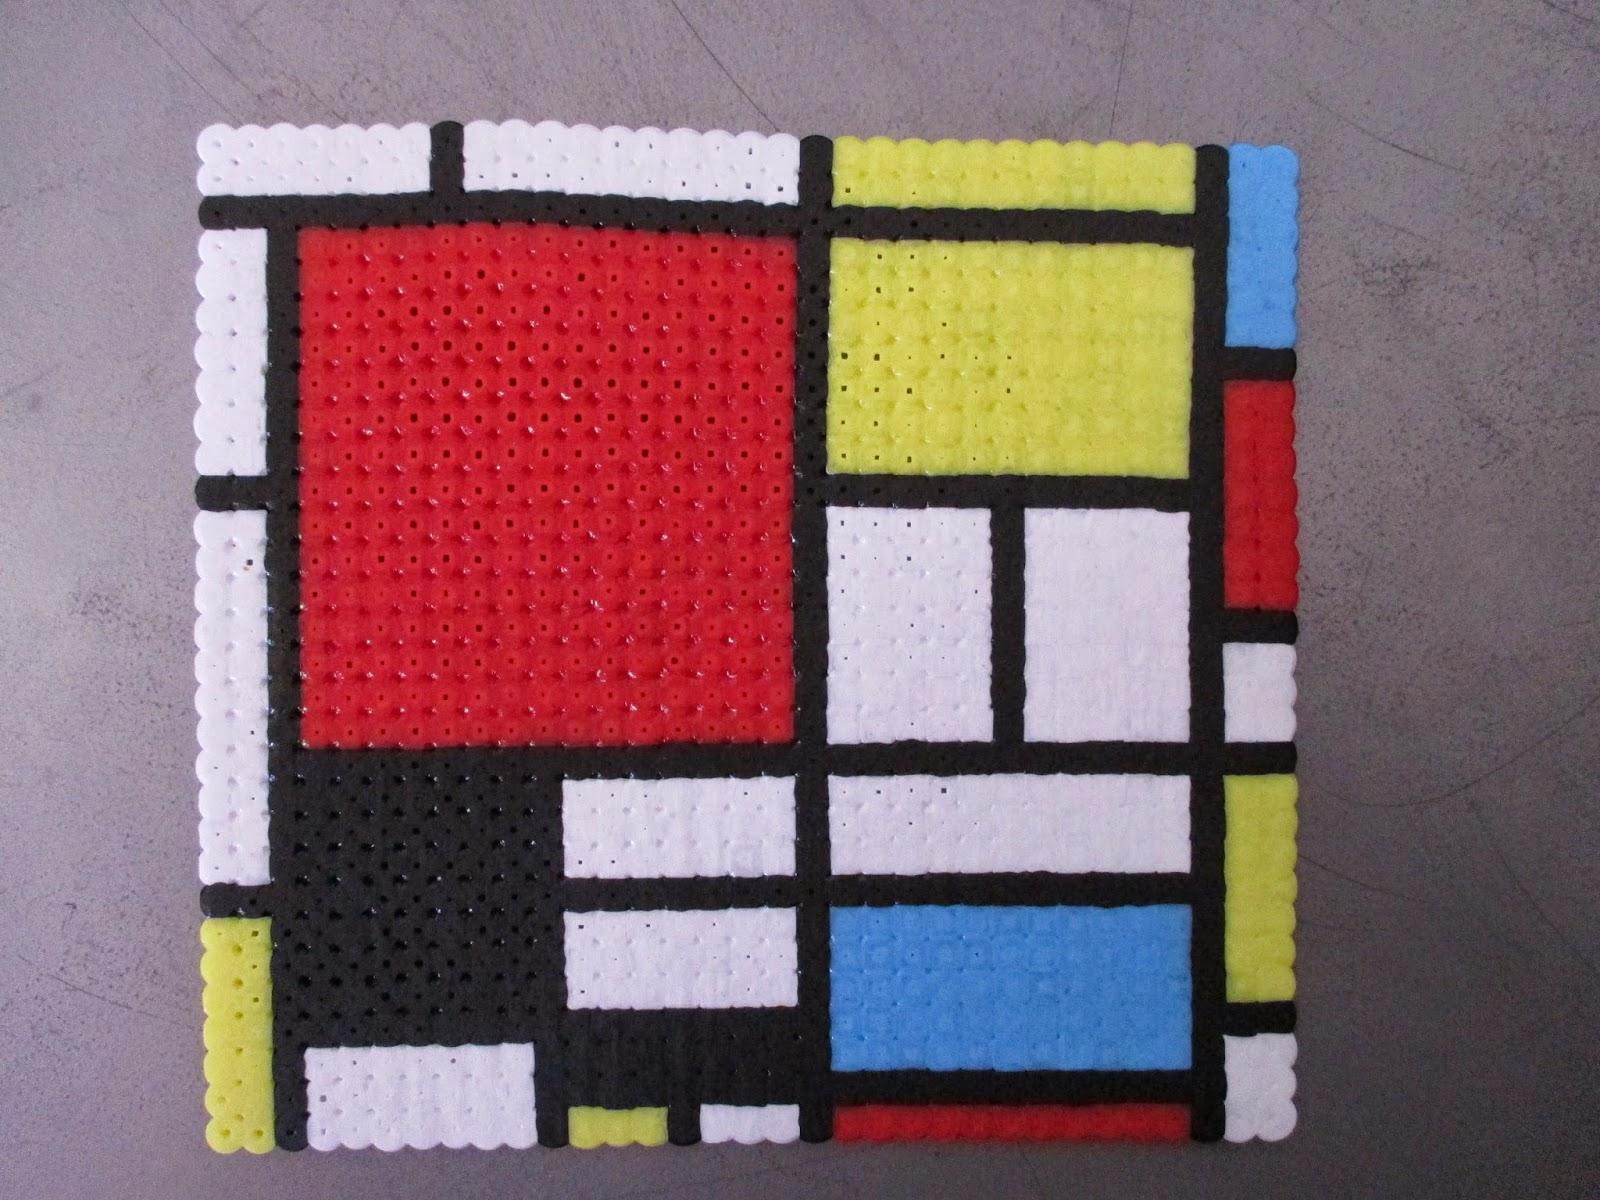 Pixel art en perle hama toile de mondrian en perle repasser - Peinture facile a reproduire ...